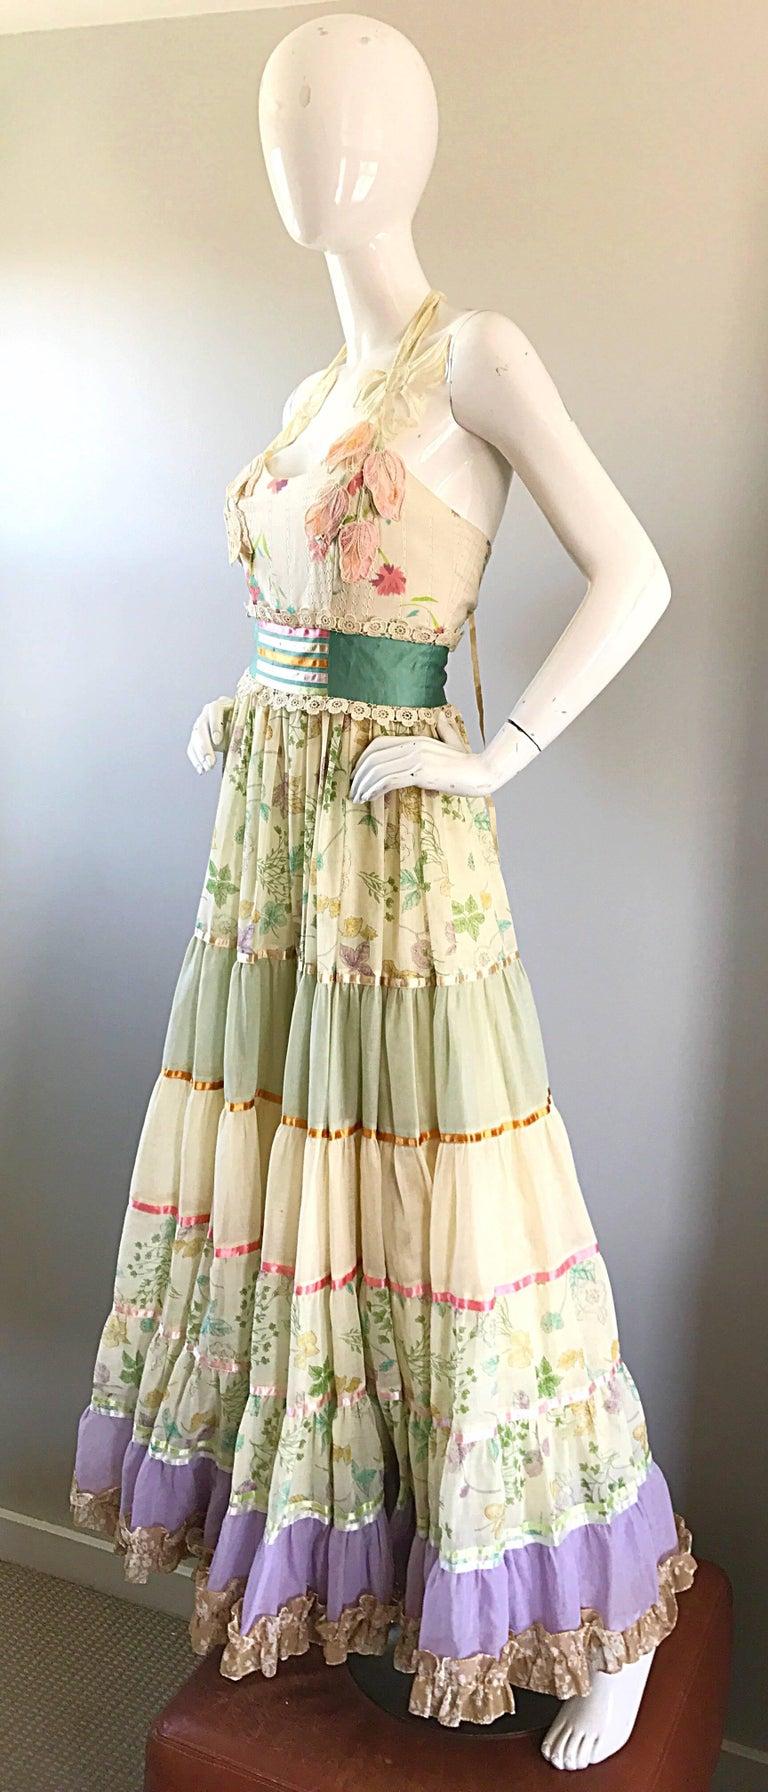 Women's Giorgio di Sant Angelo Colorful Cotton Voile 70s Couture Maxi Dress Gown  For Sale